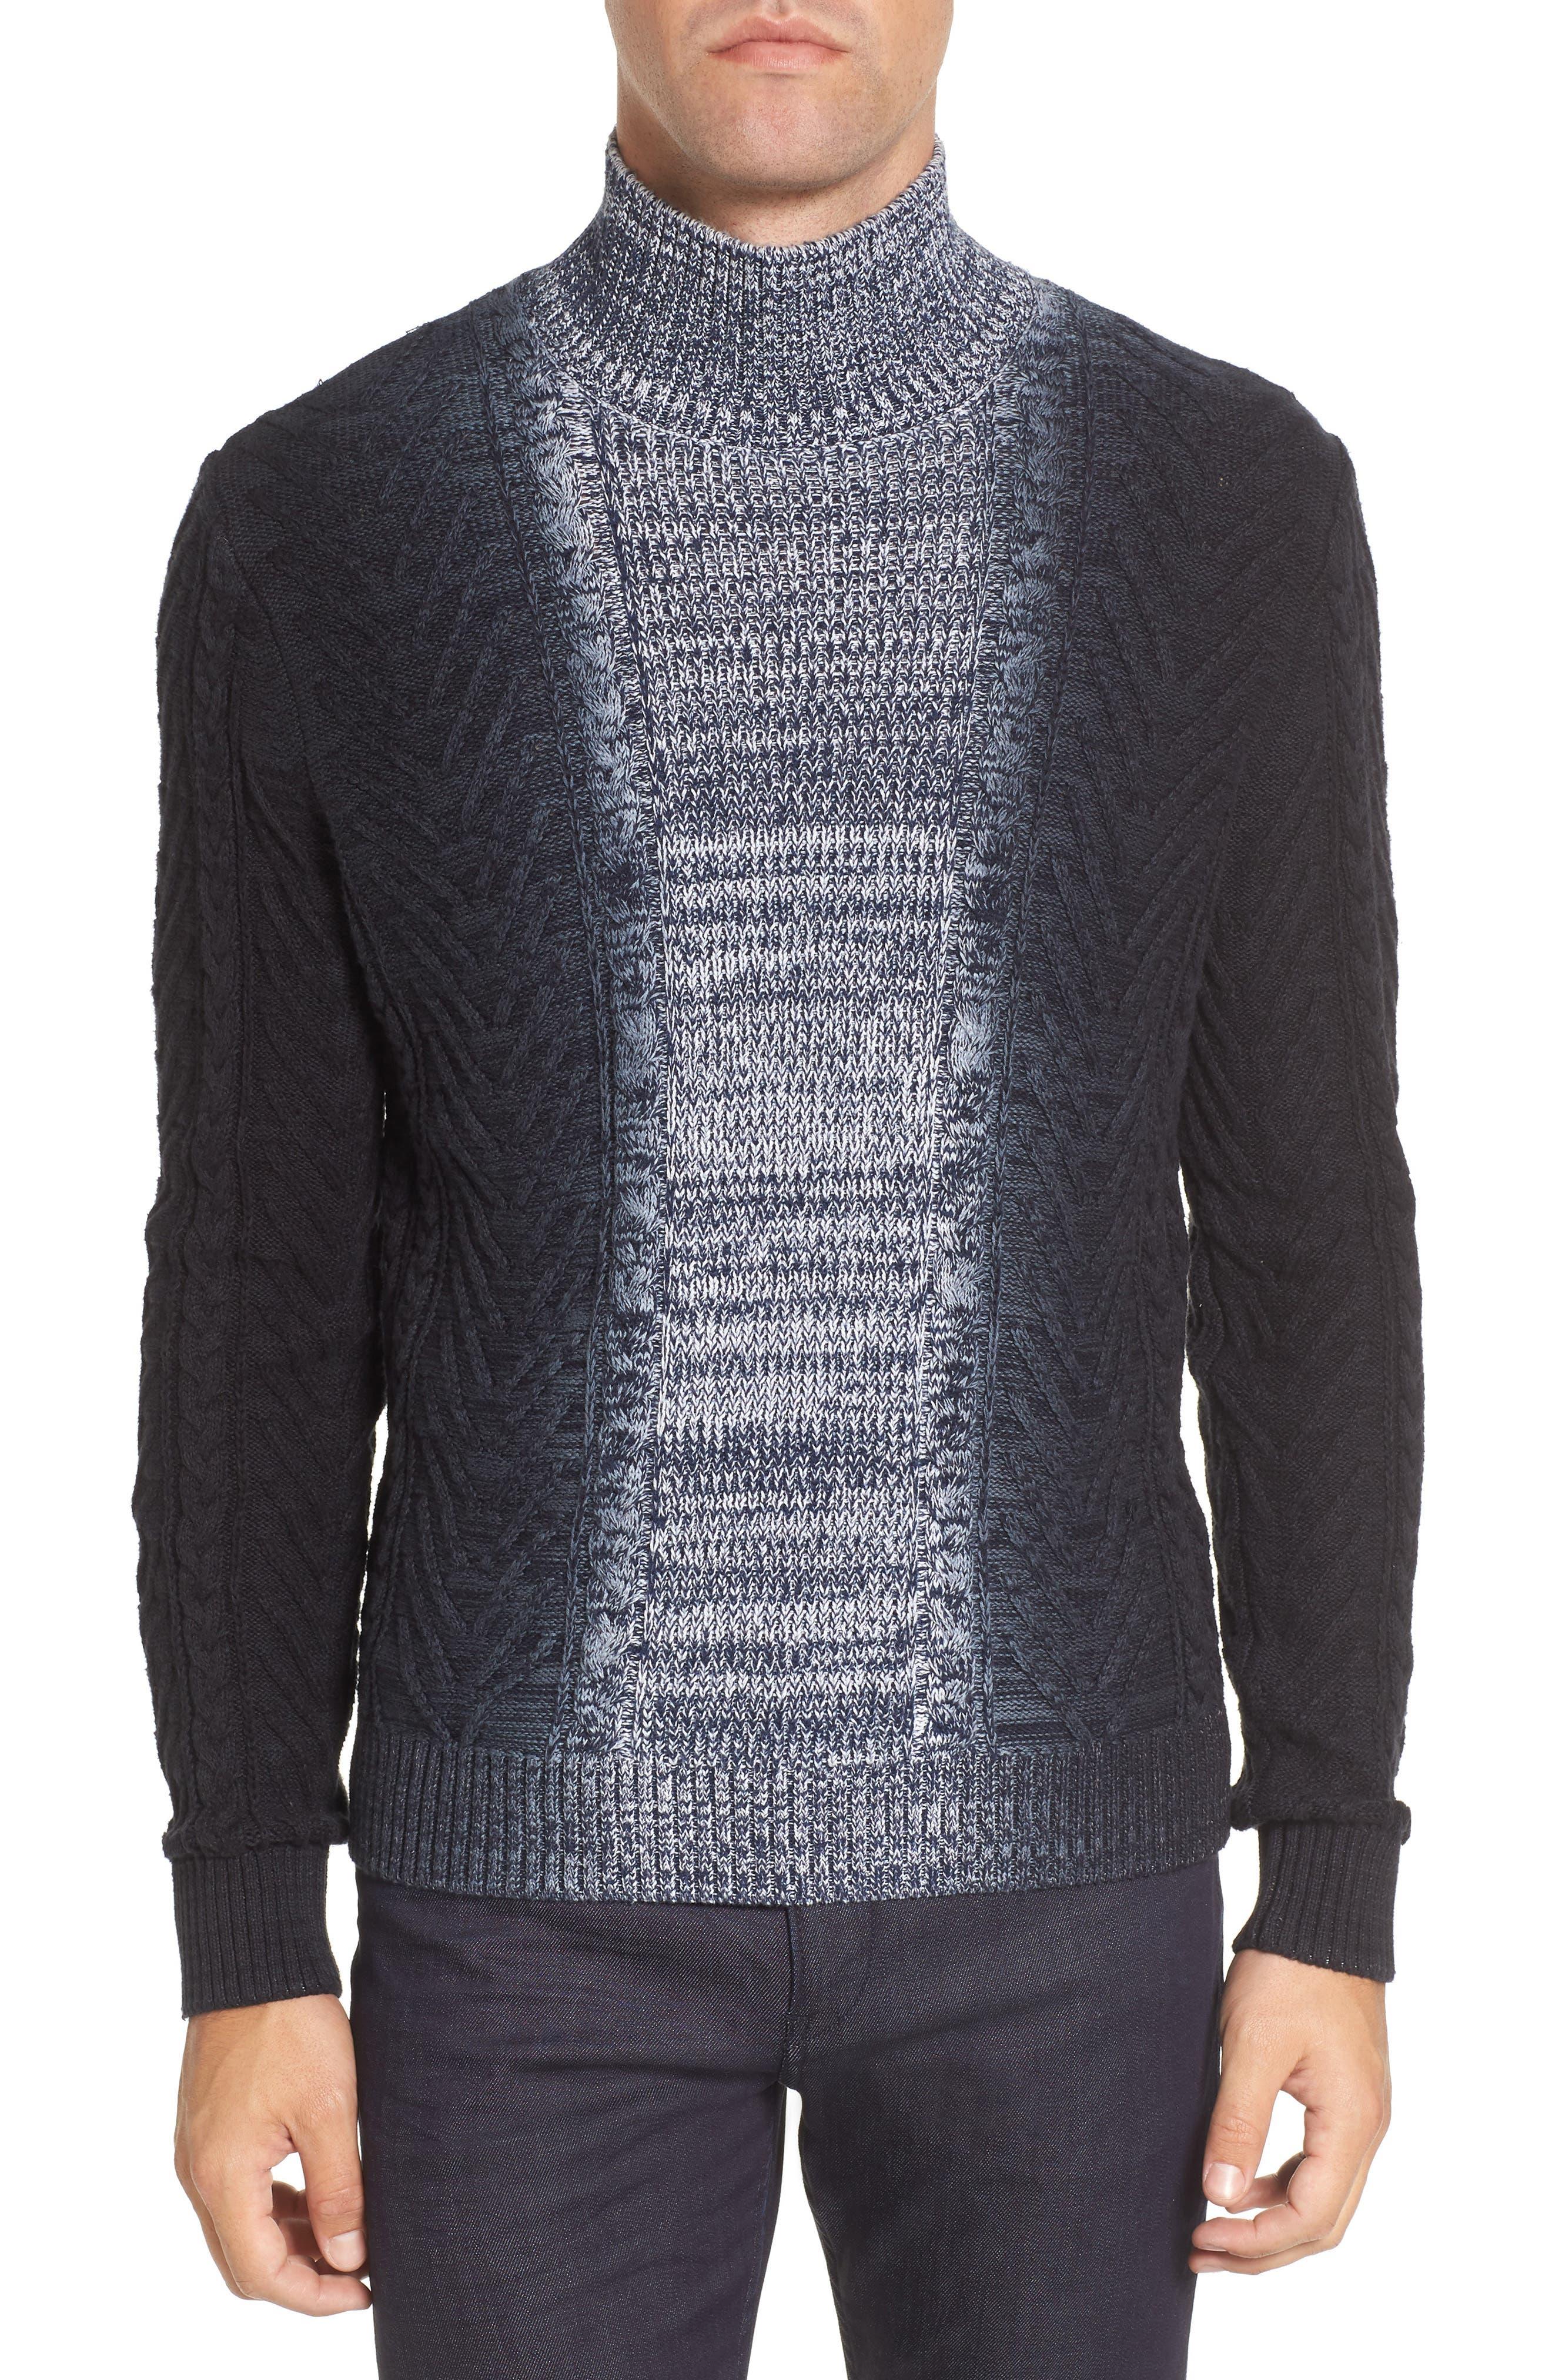 Main Image - Vince Camuto Gradient Fade Turtleneck Sweater